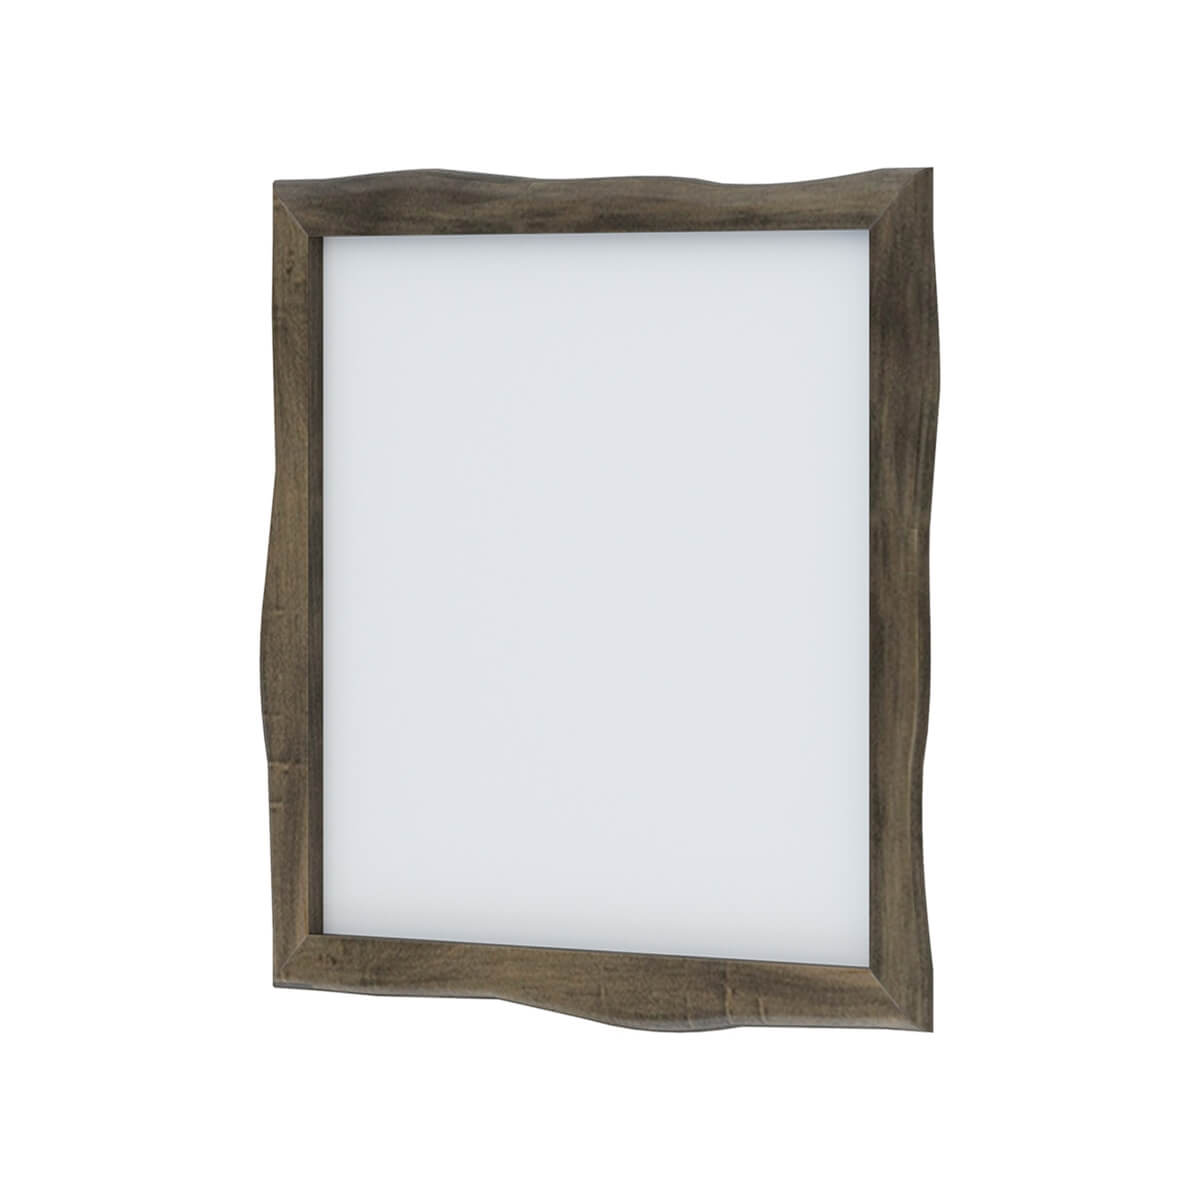 Ambler Mahogany Wood Live Edge Square Mirror Frame